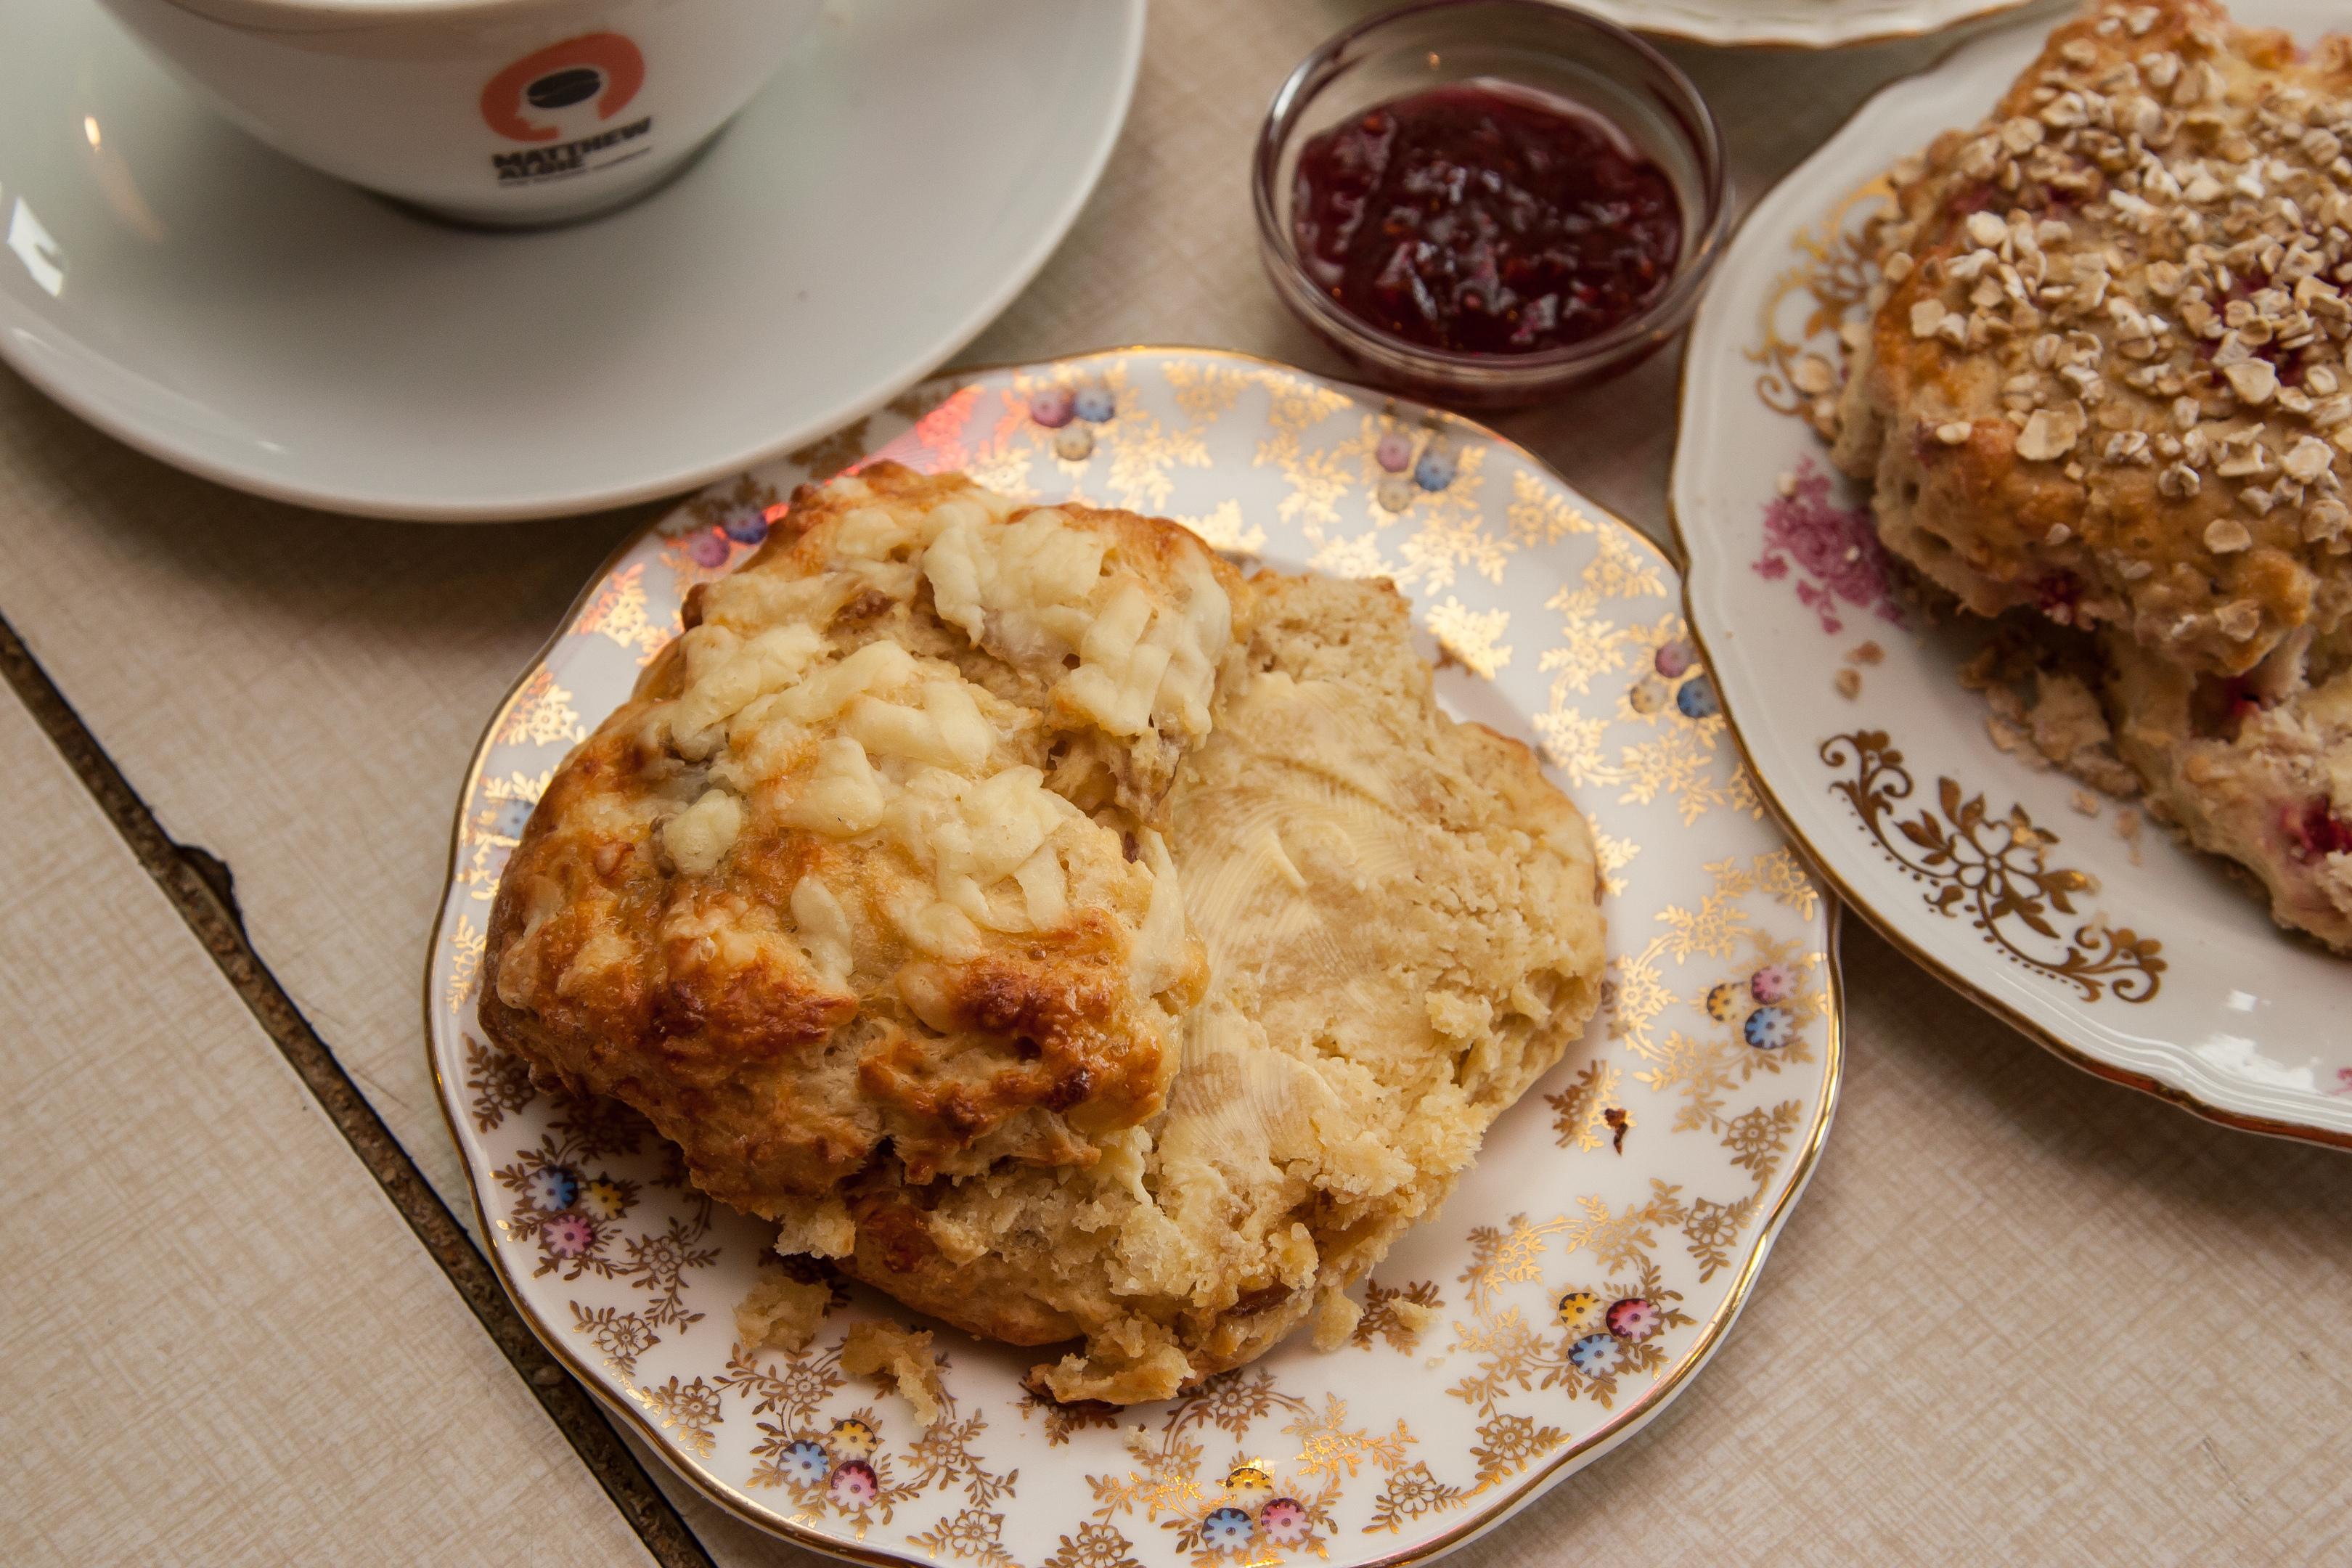 Kitschnbake Café's scone (Tina Norris)